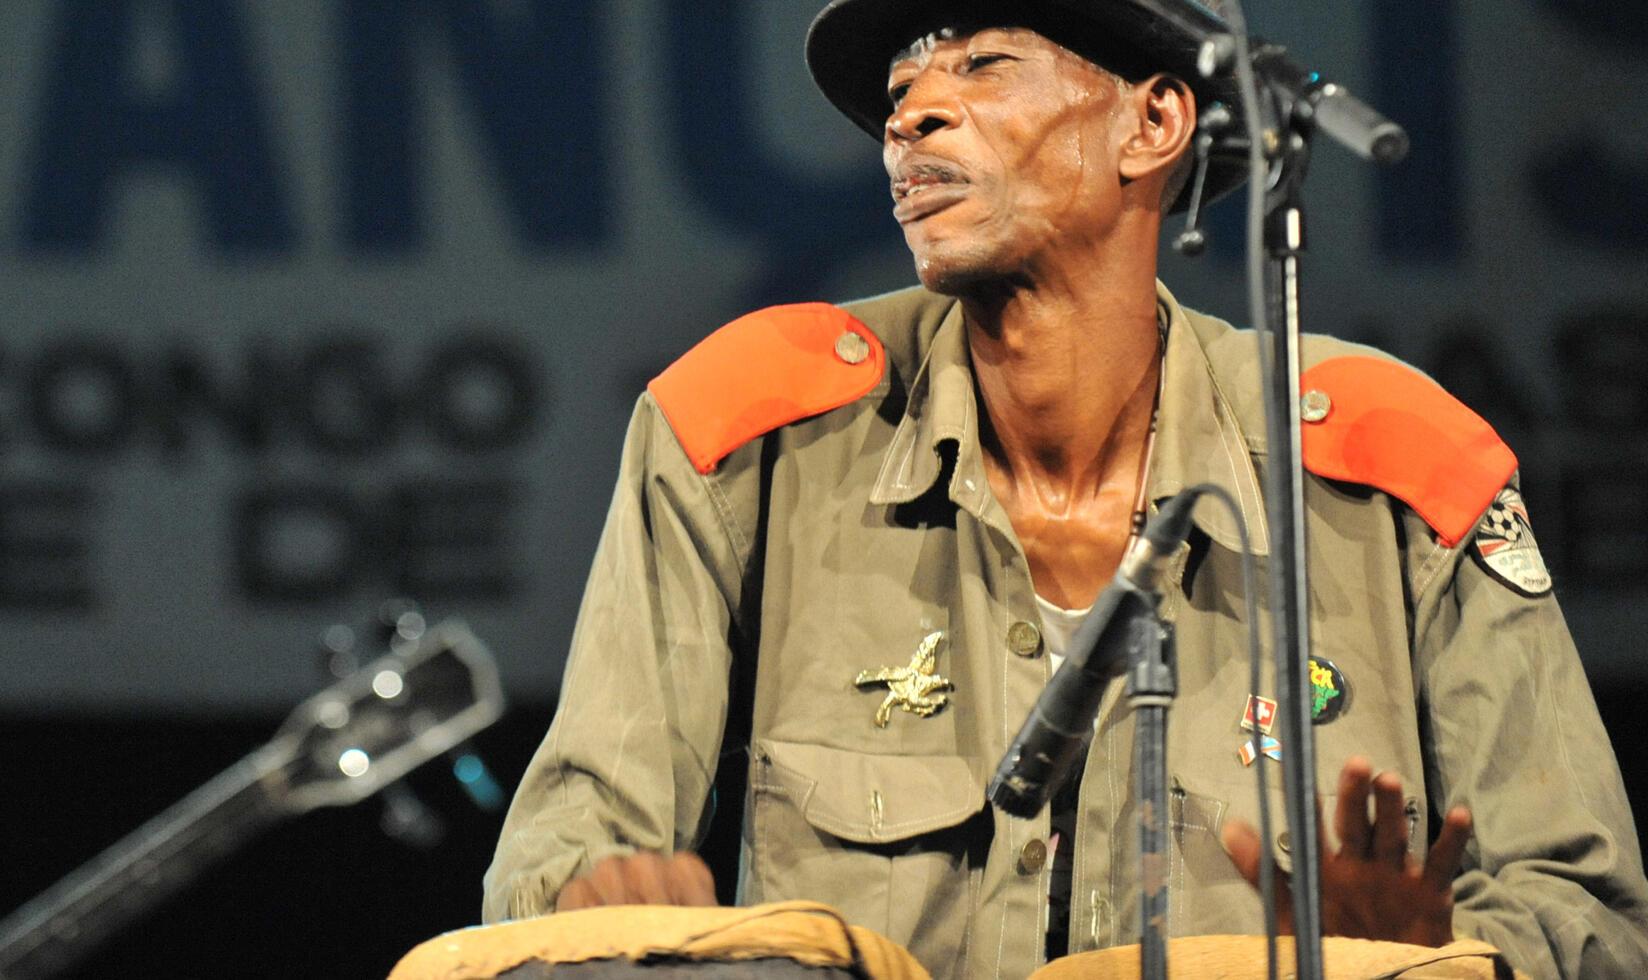 L'artiste congolais Jupiter en 2013 à Kinshasa.